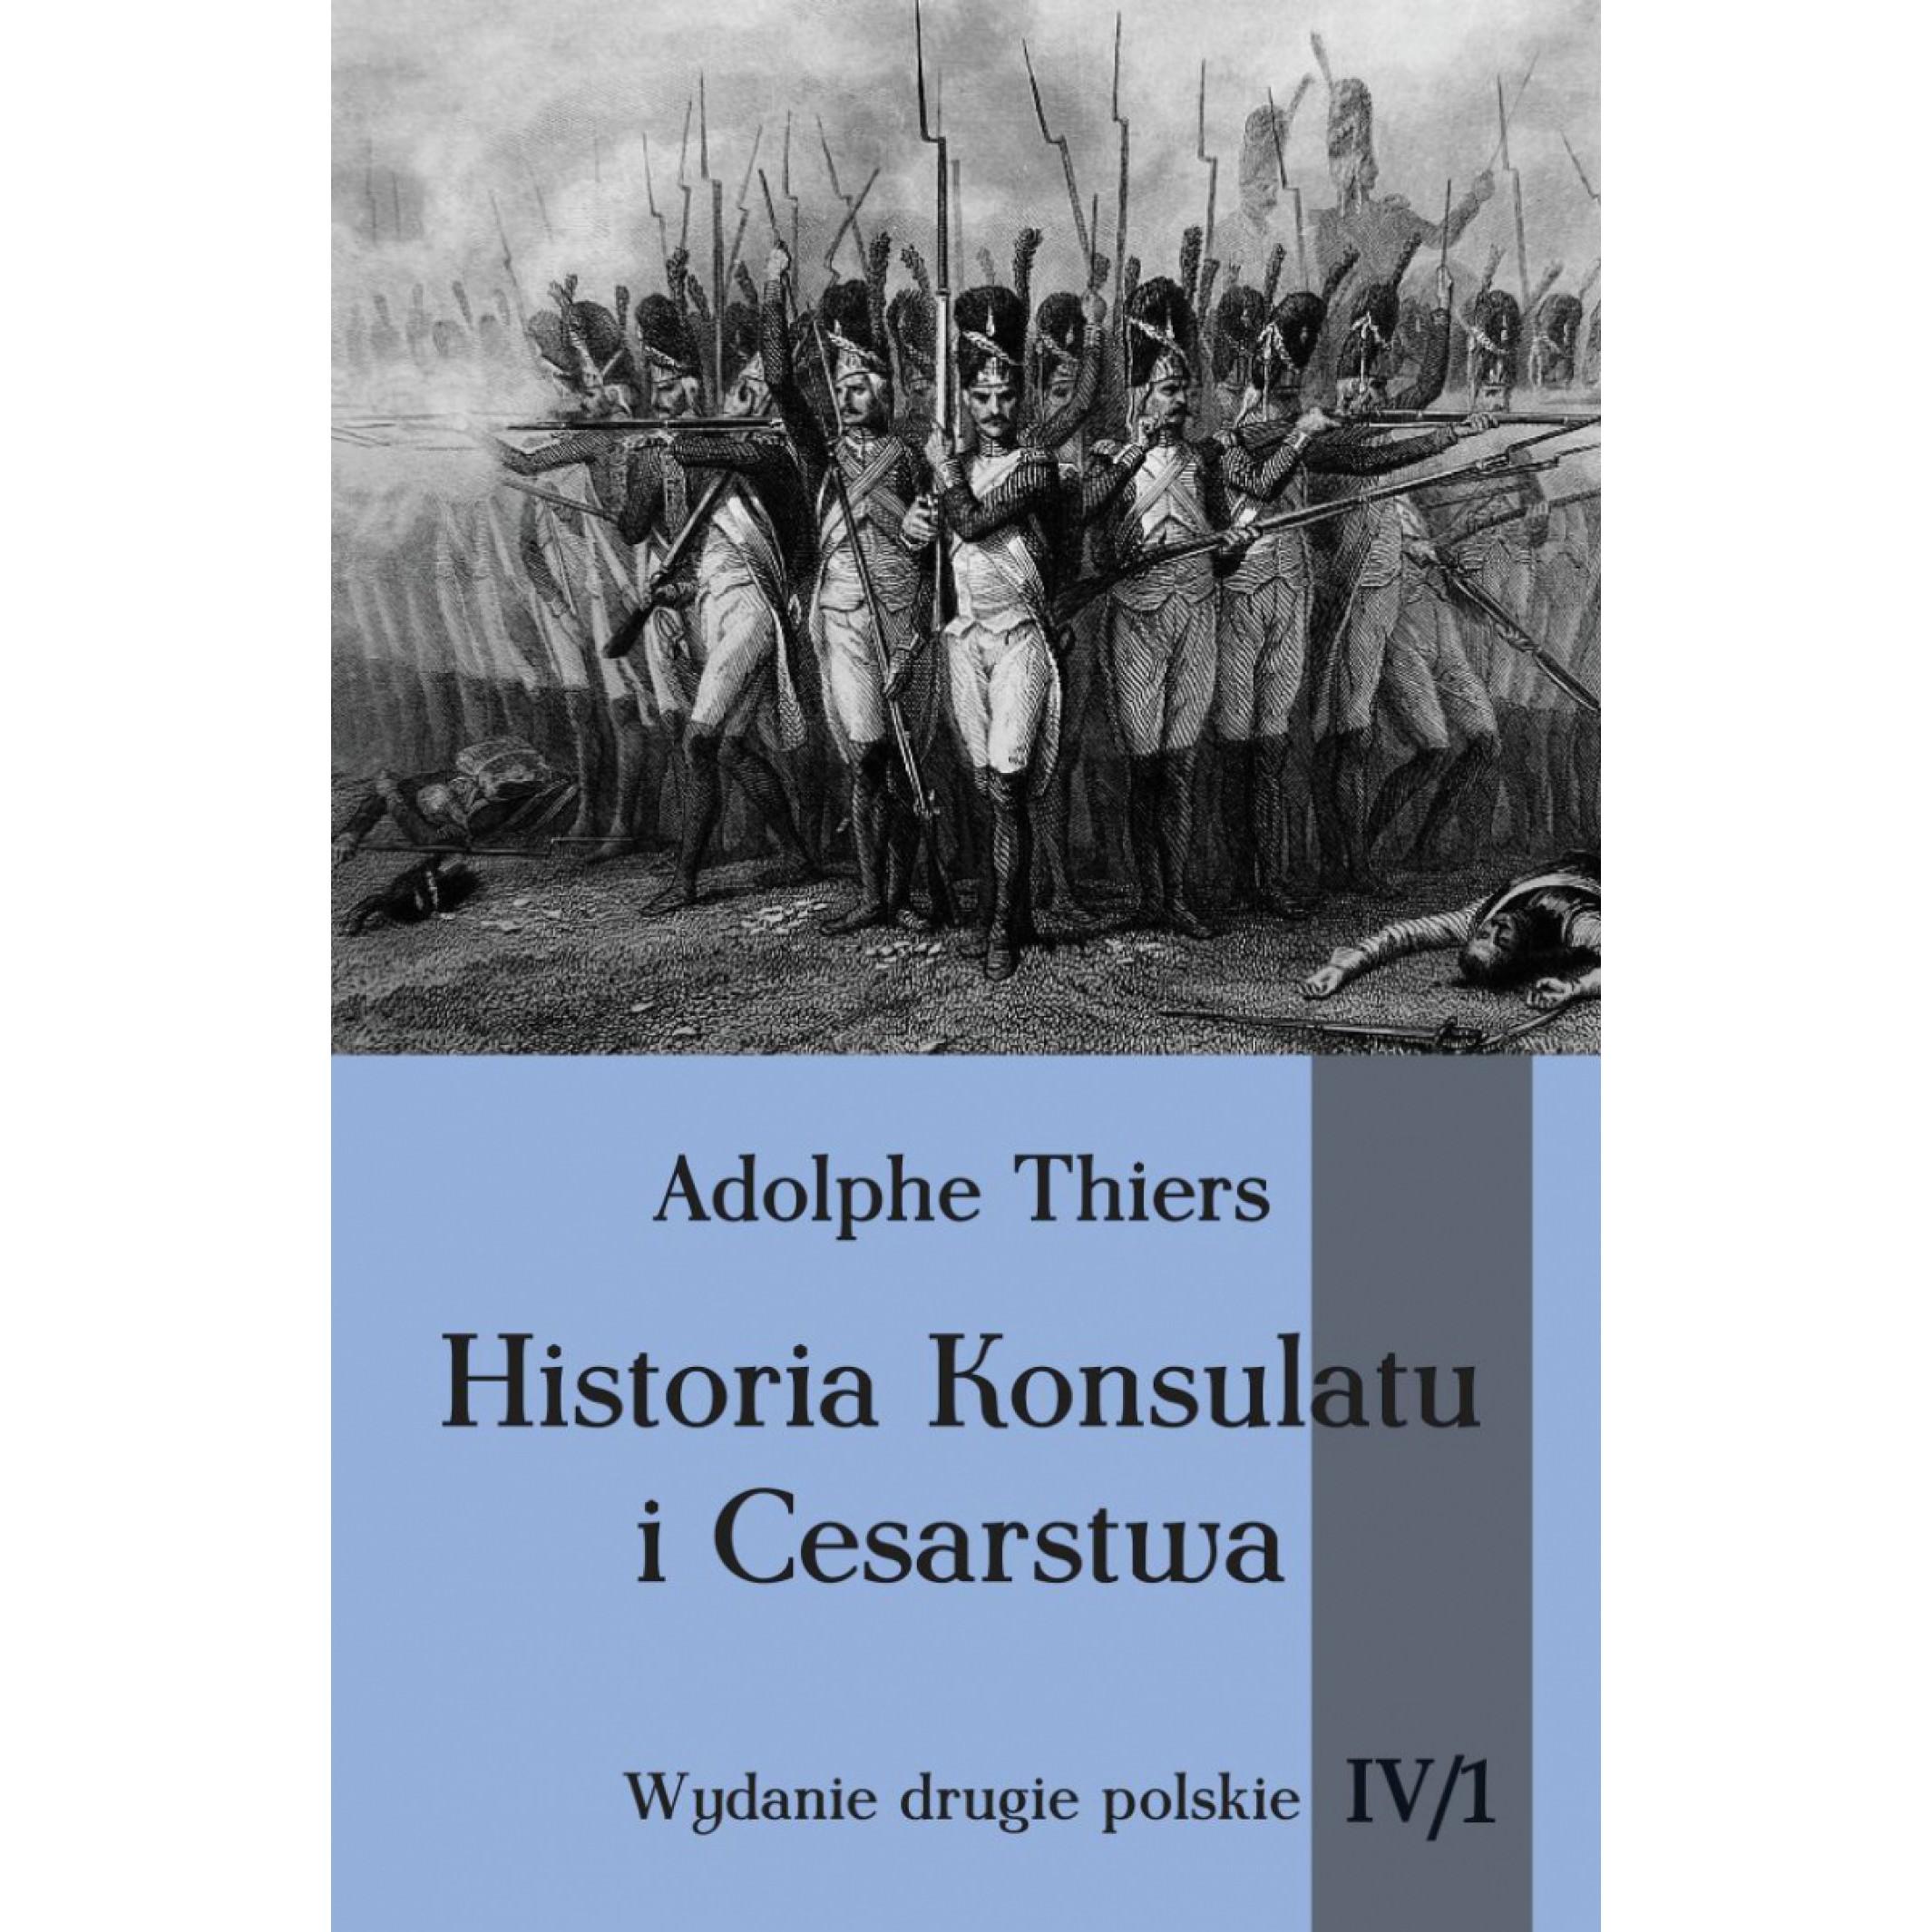 Historia Konsulatu i Cesarstwa tom IV cz. 1